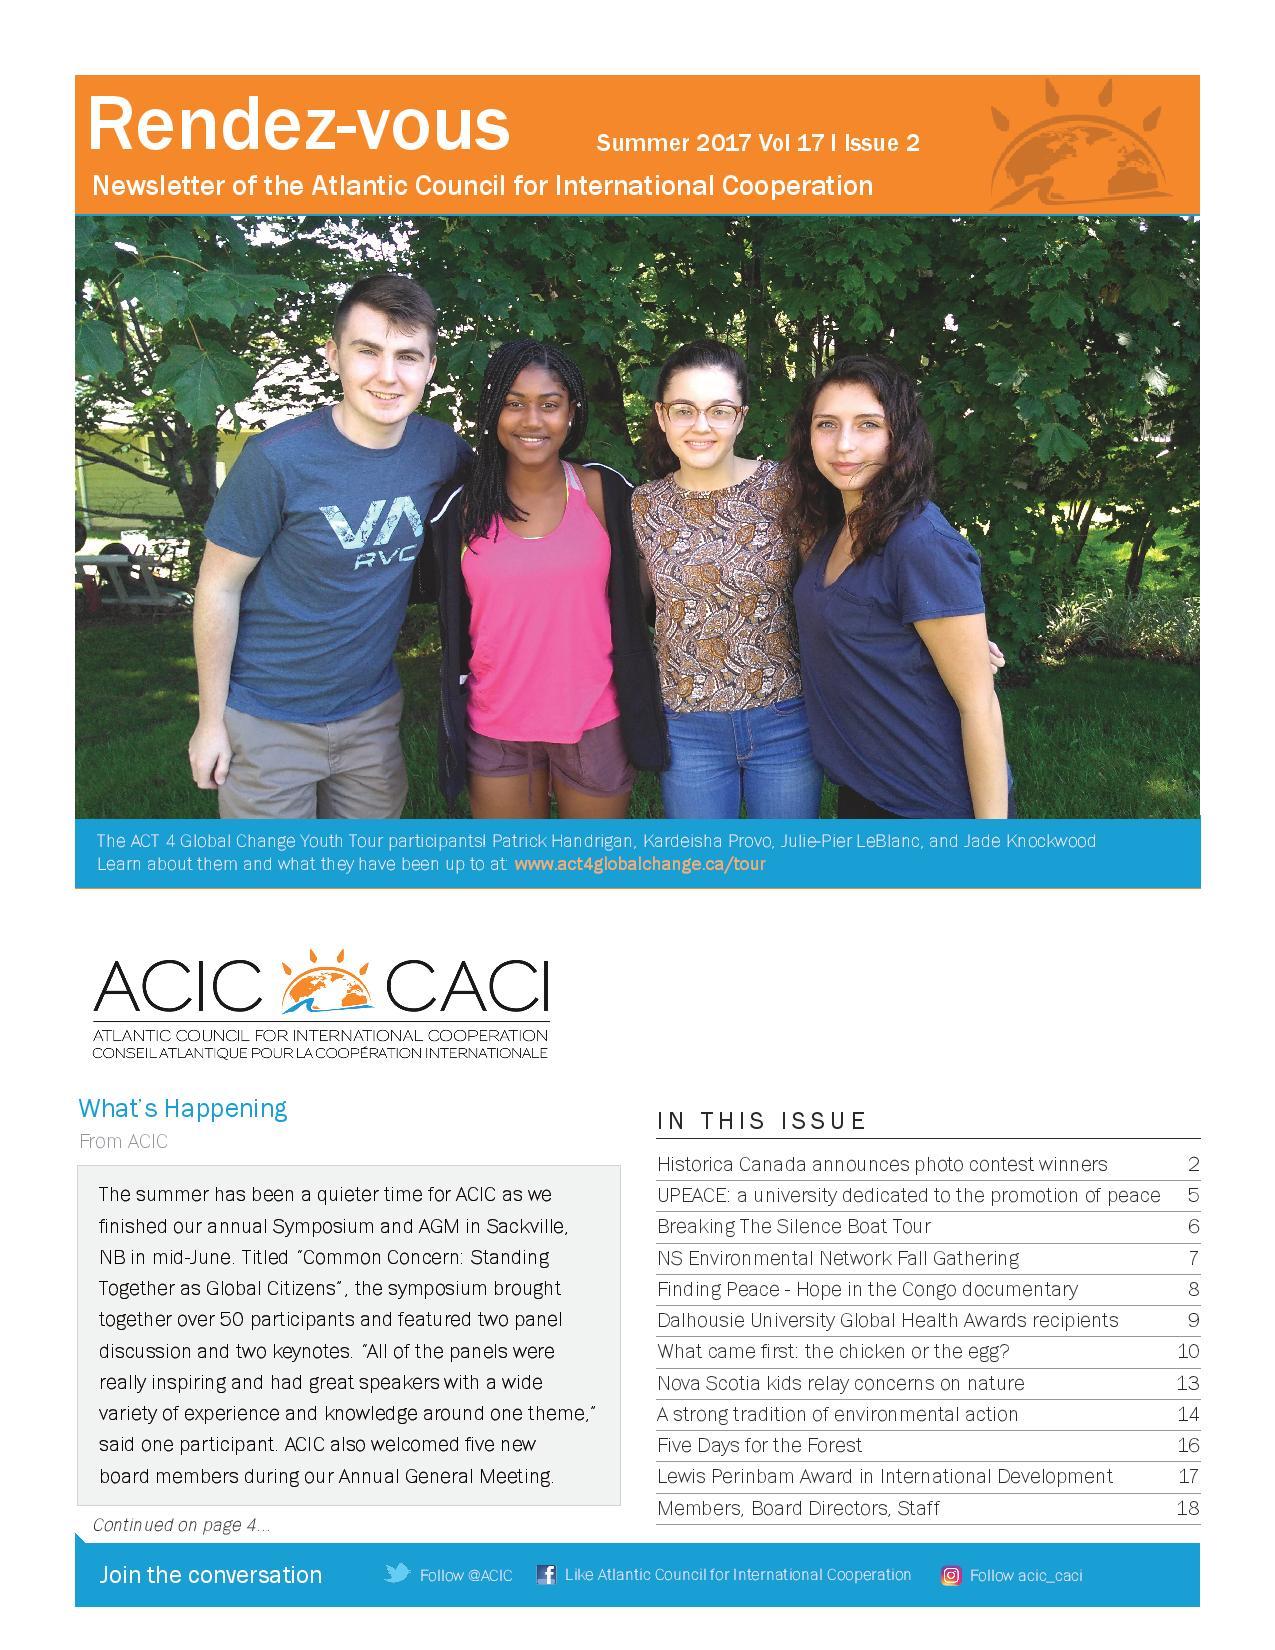 ACIC Rendez Vous Summer 2017.jpg